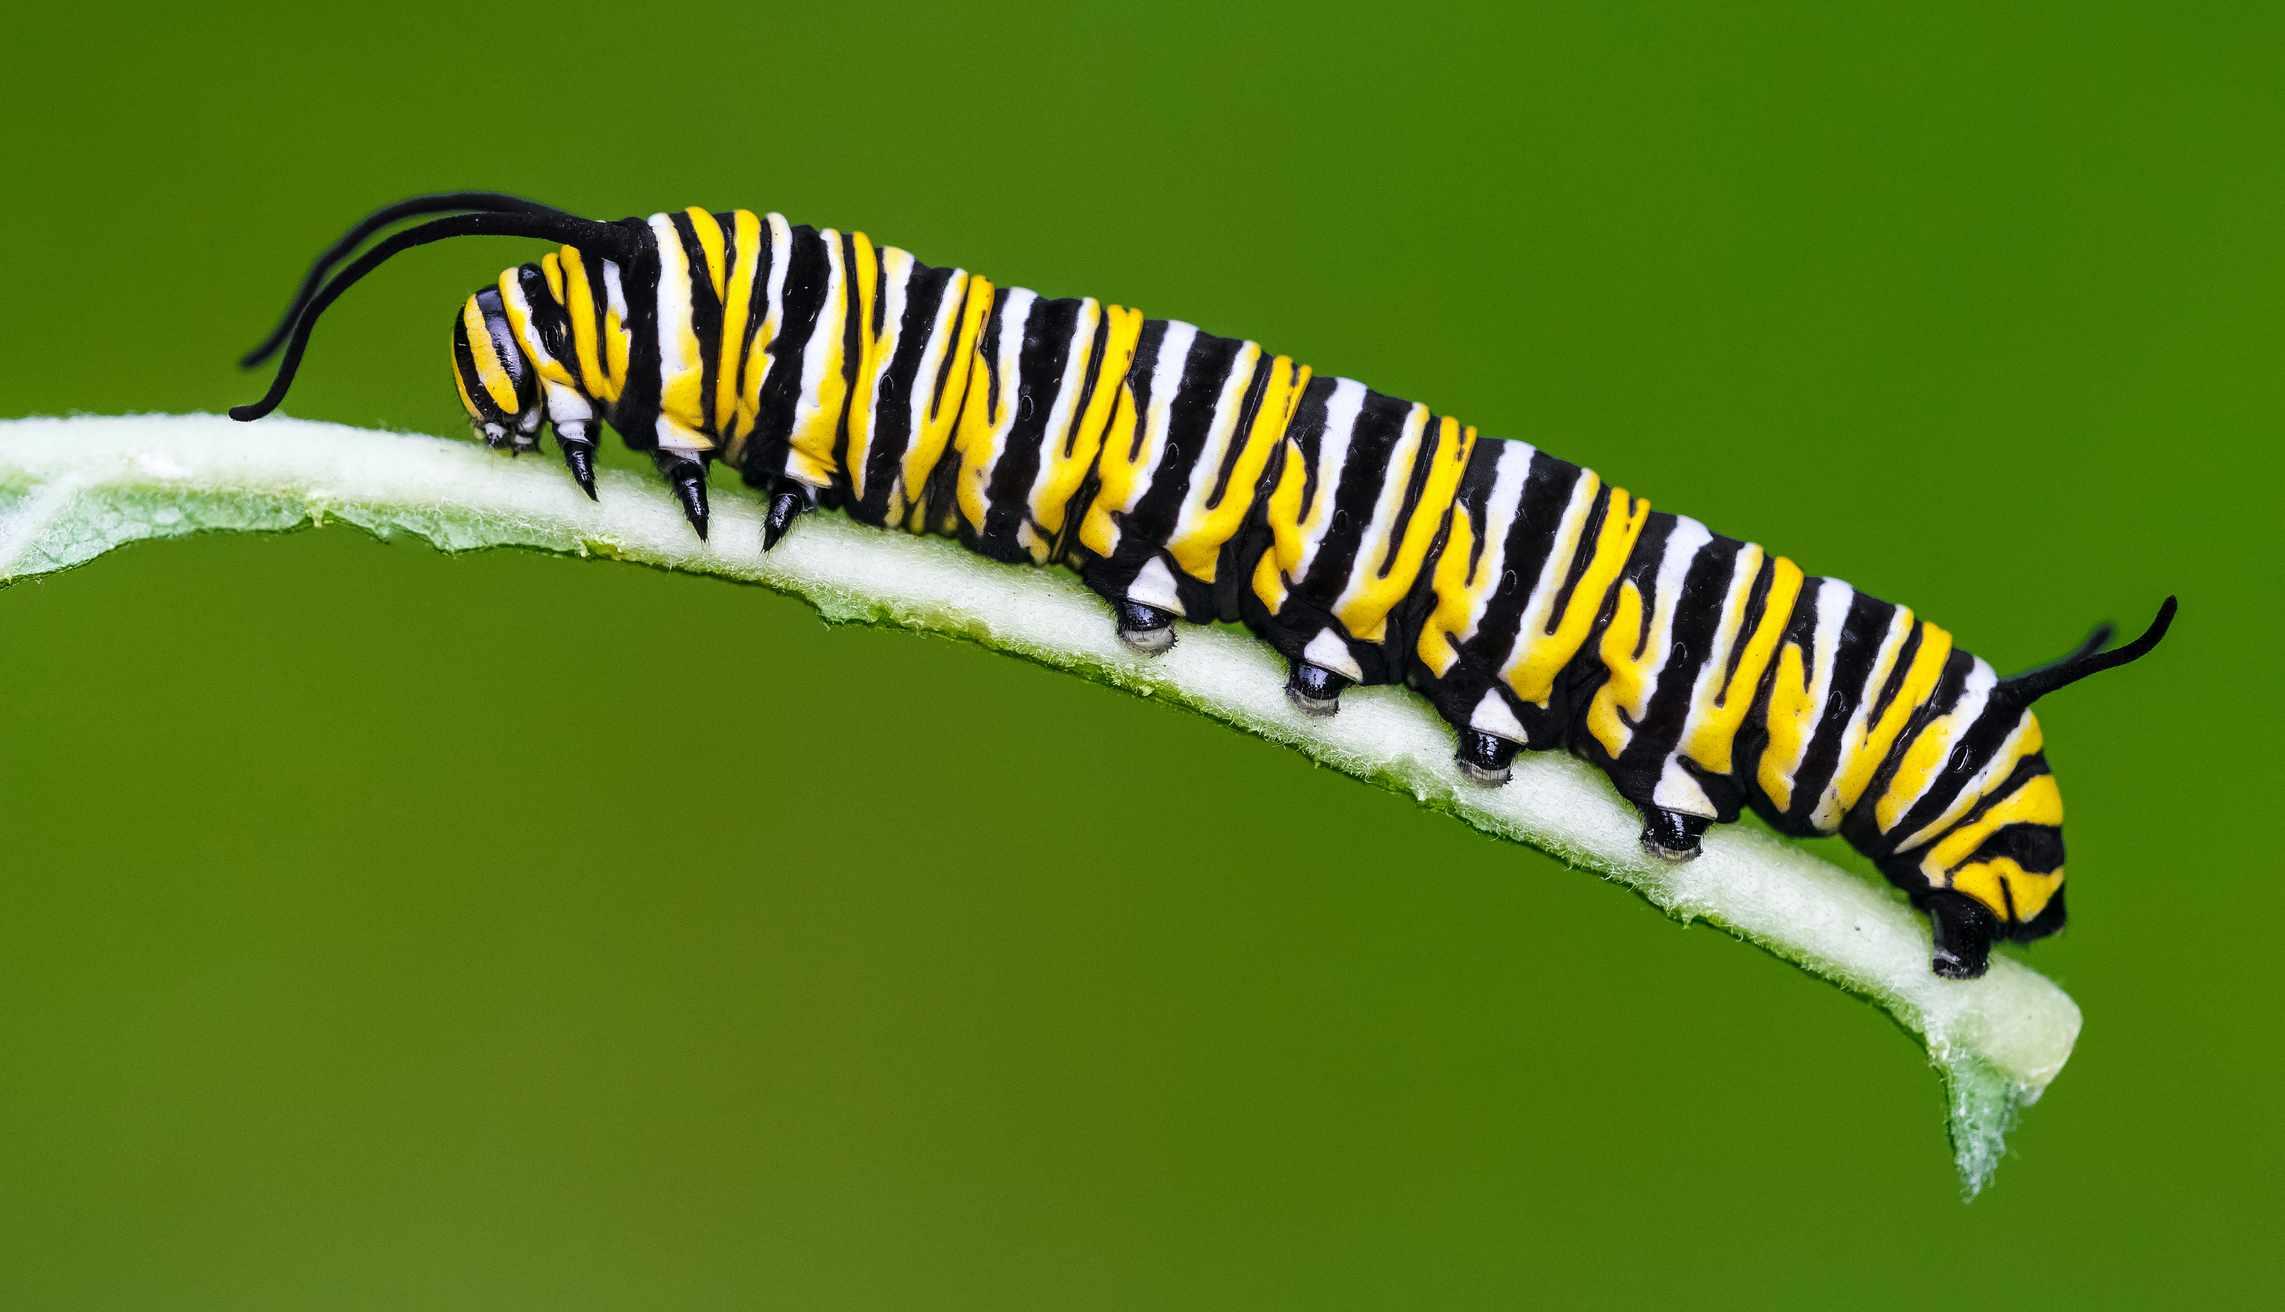 Danaus plexippus – Monarch butterfly caterpillar